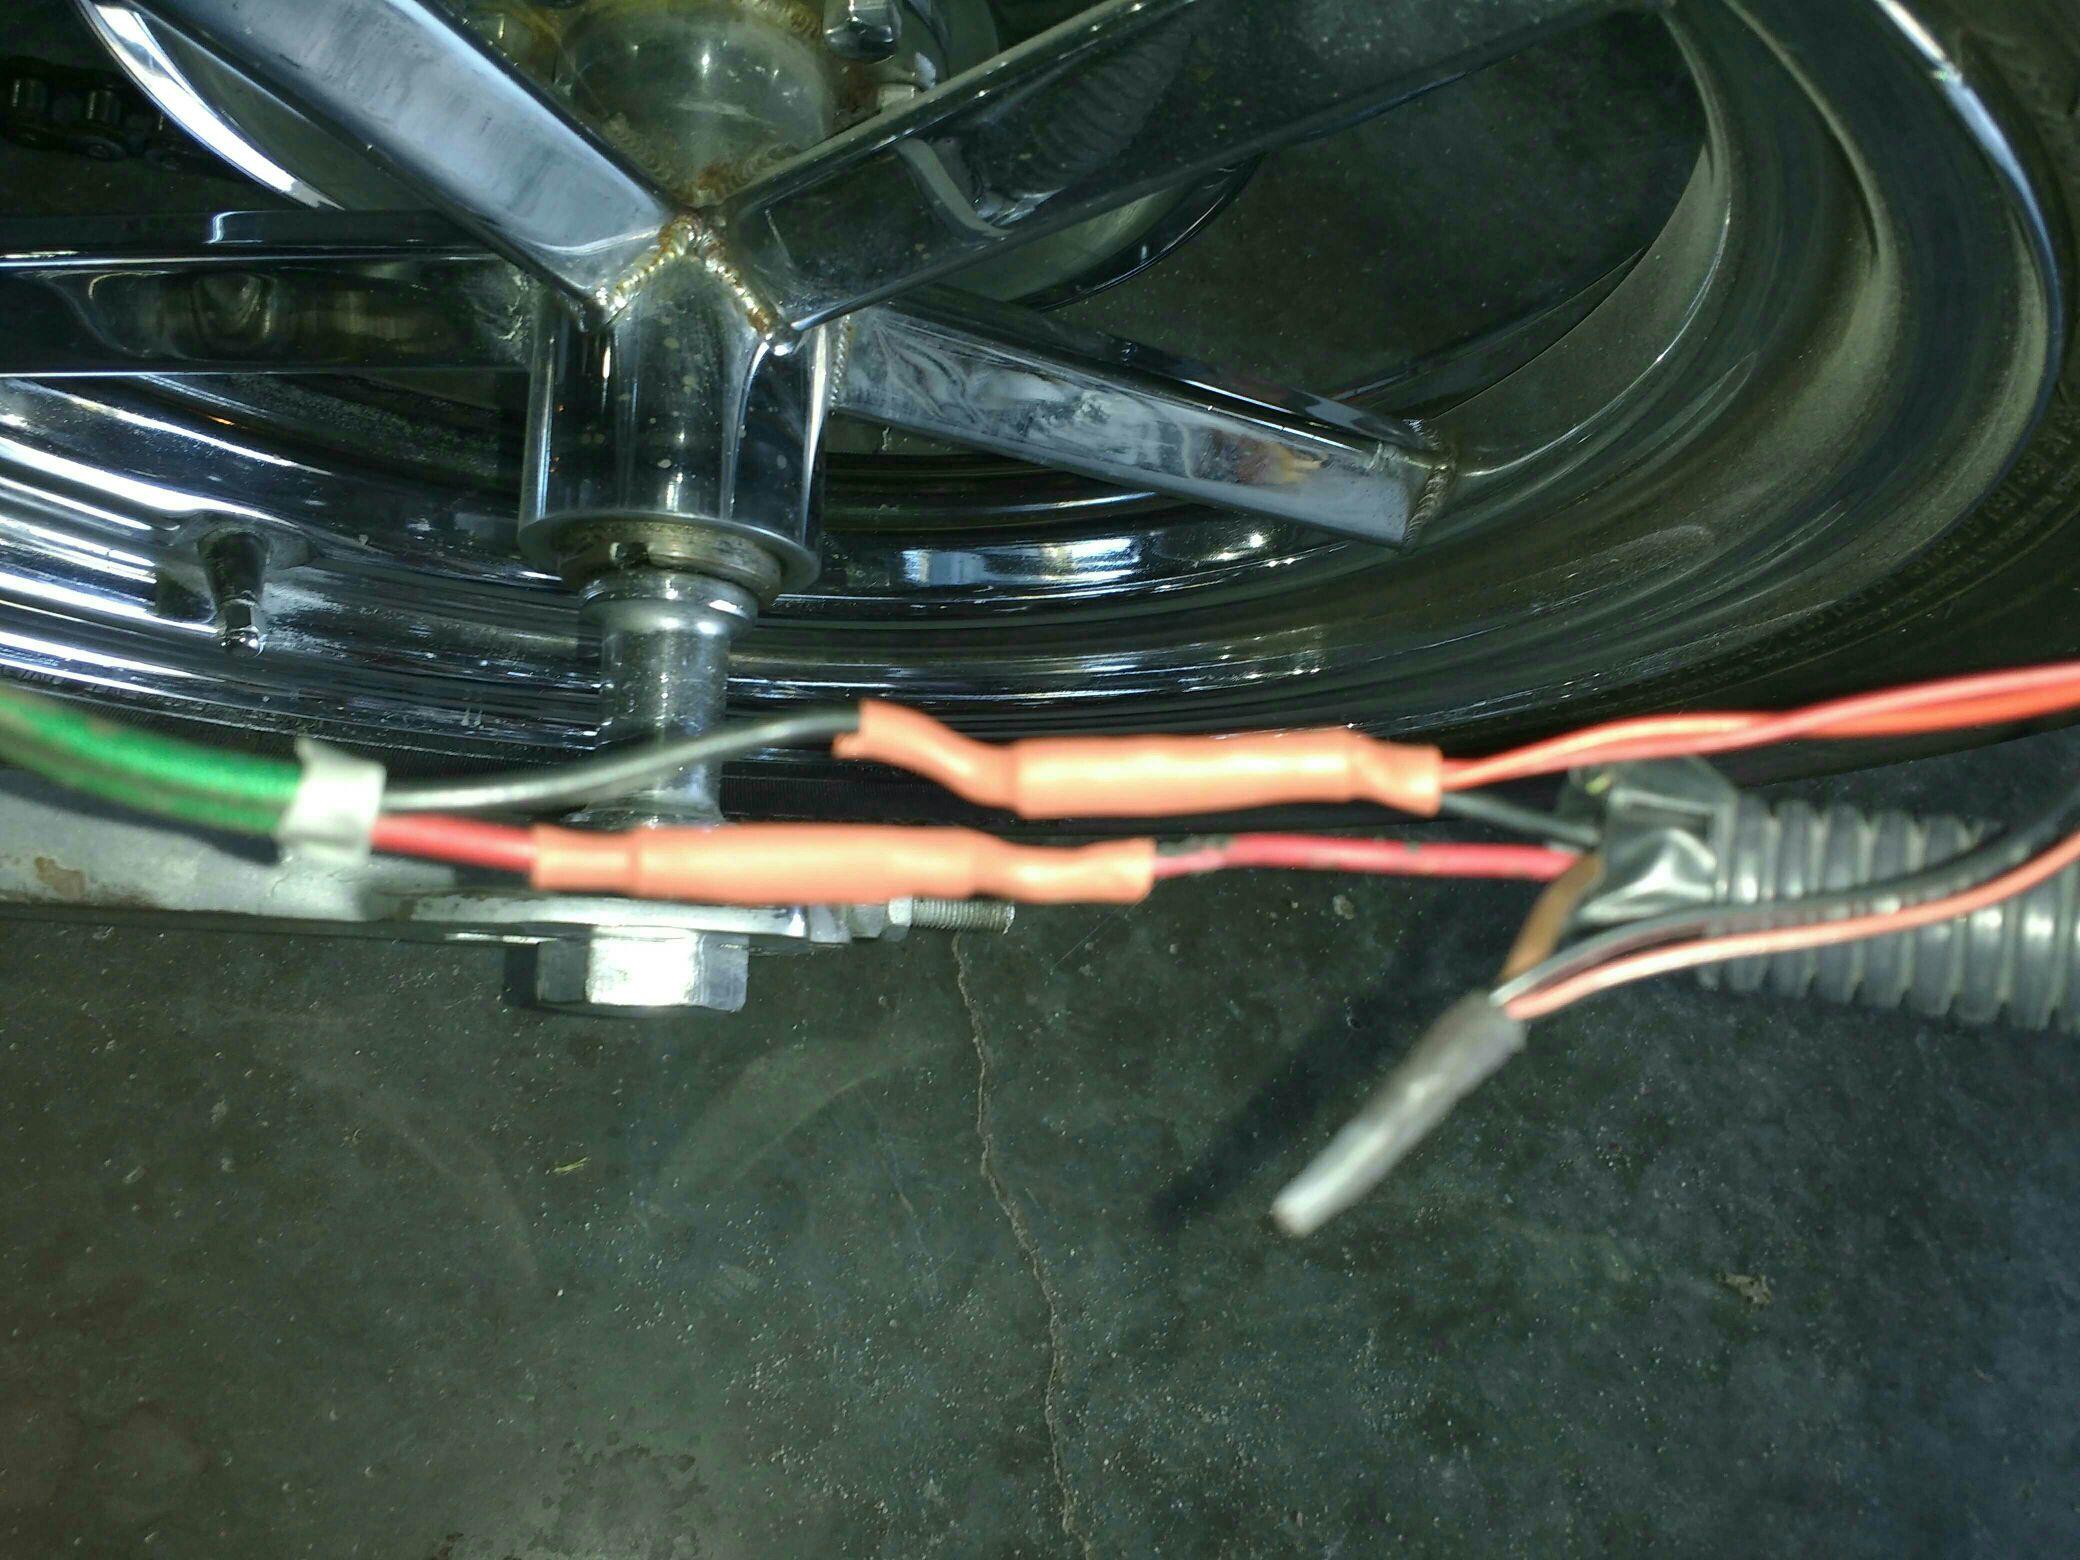 Ironhead 1975 Sporty basic wiring for kickstart - The